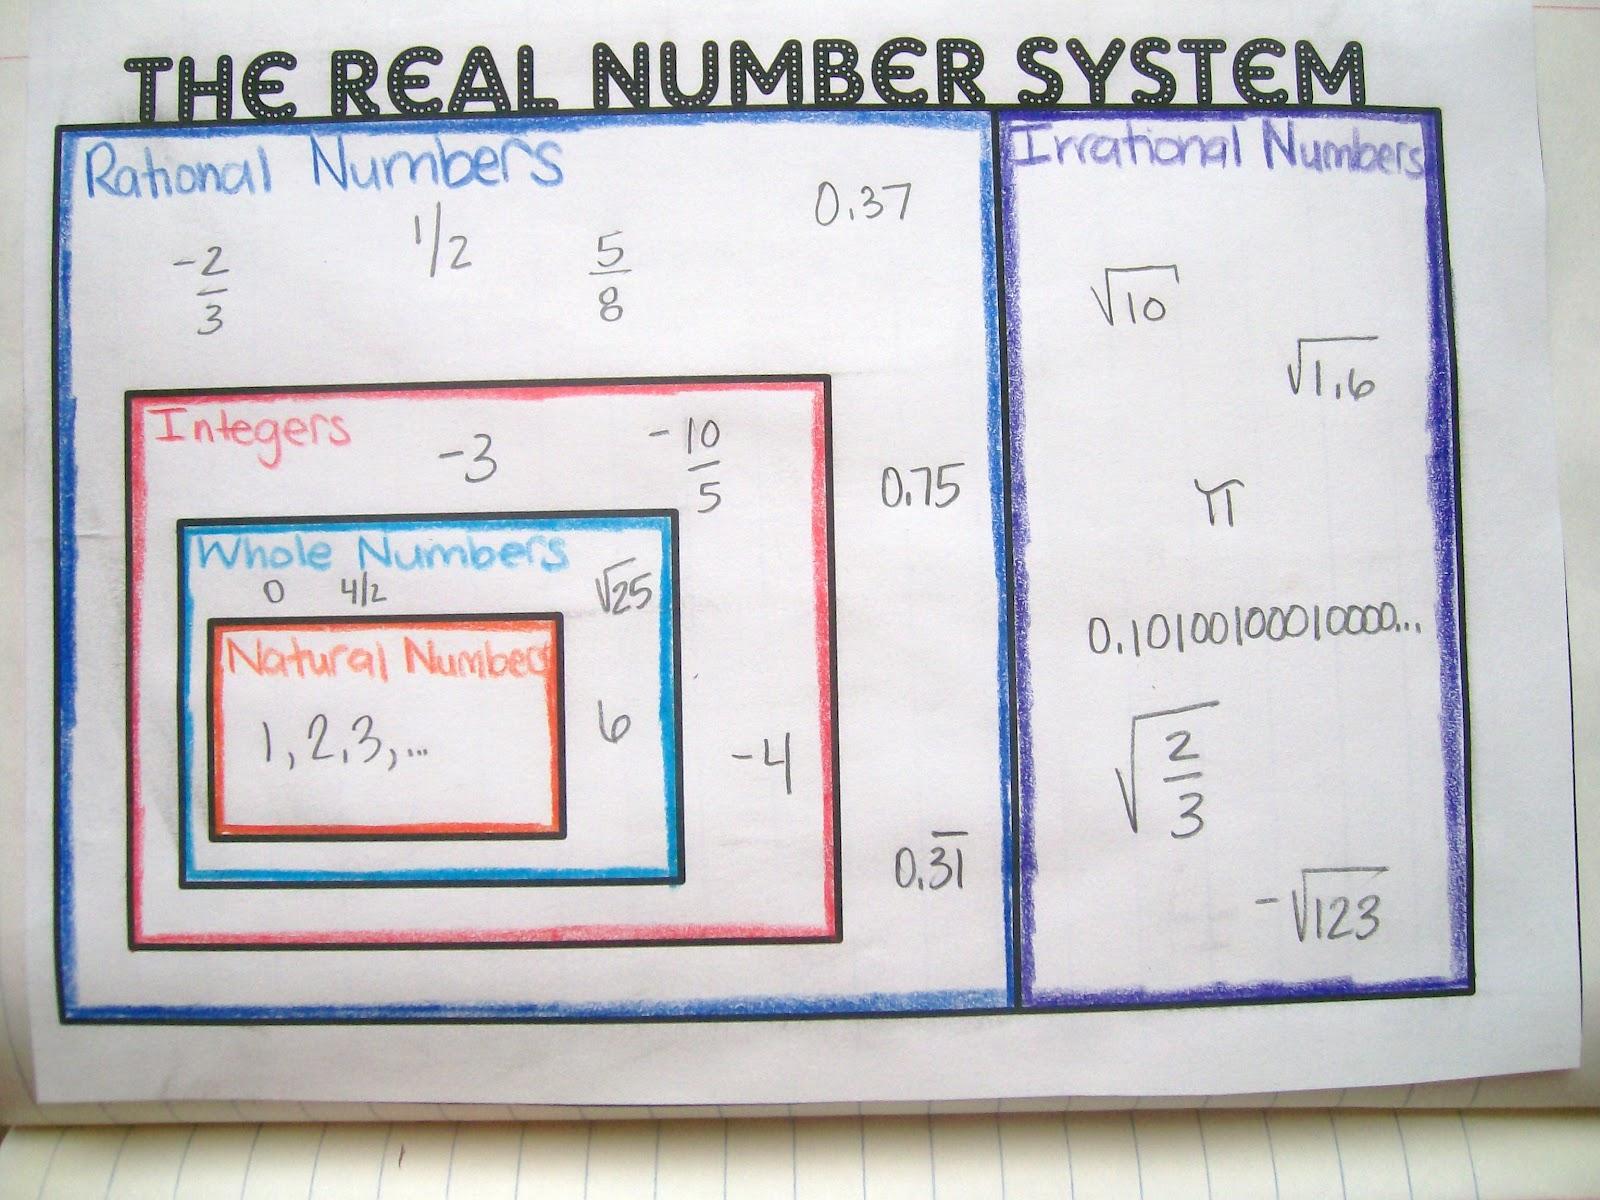 Re L Number System W Ksheet Free W Ksheets Libr Ry Downlo D